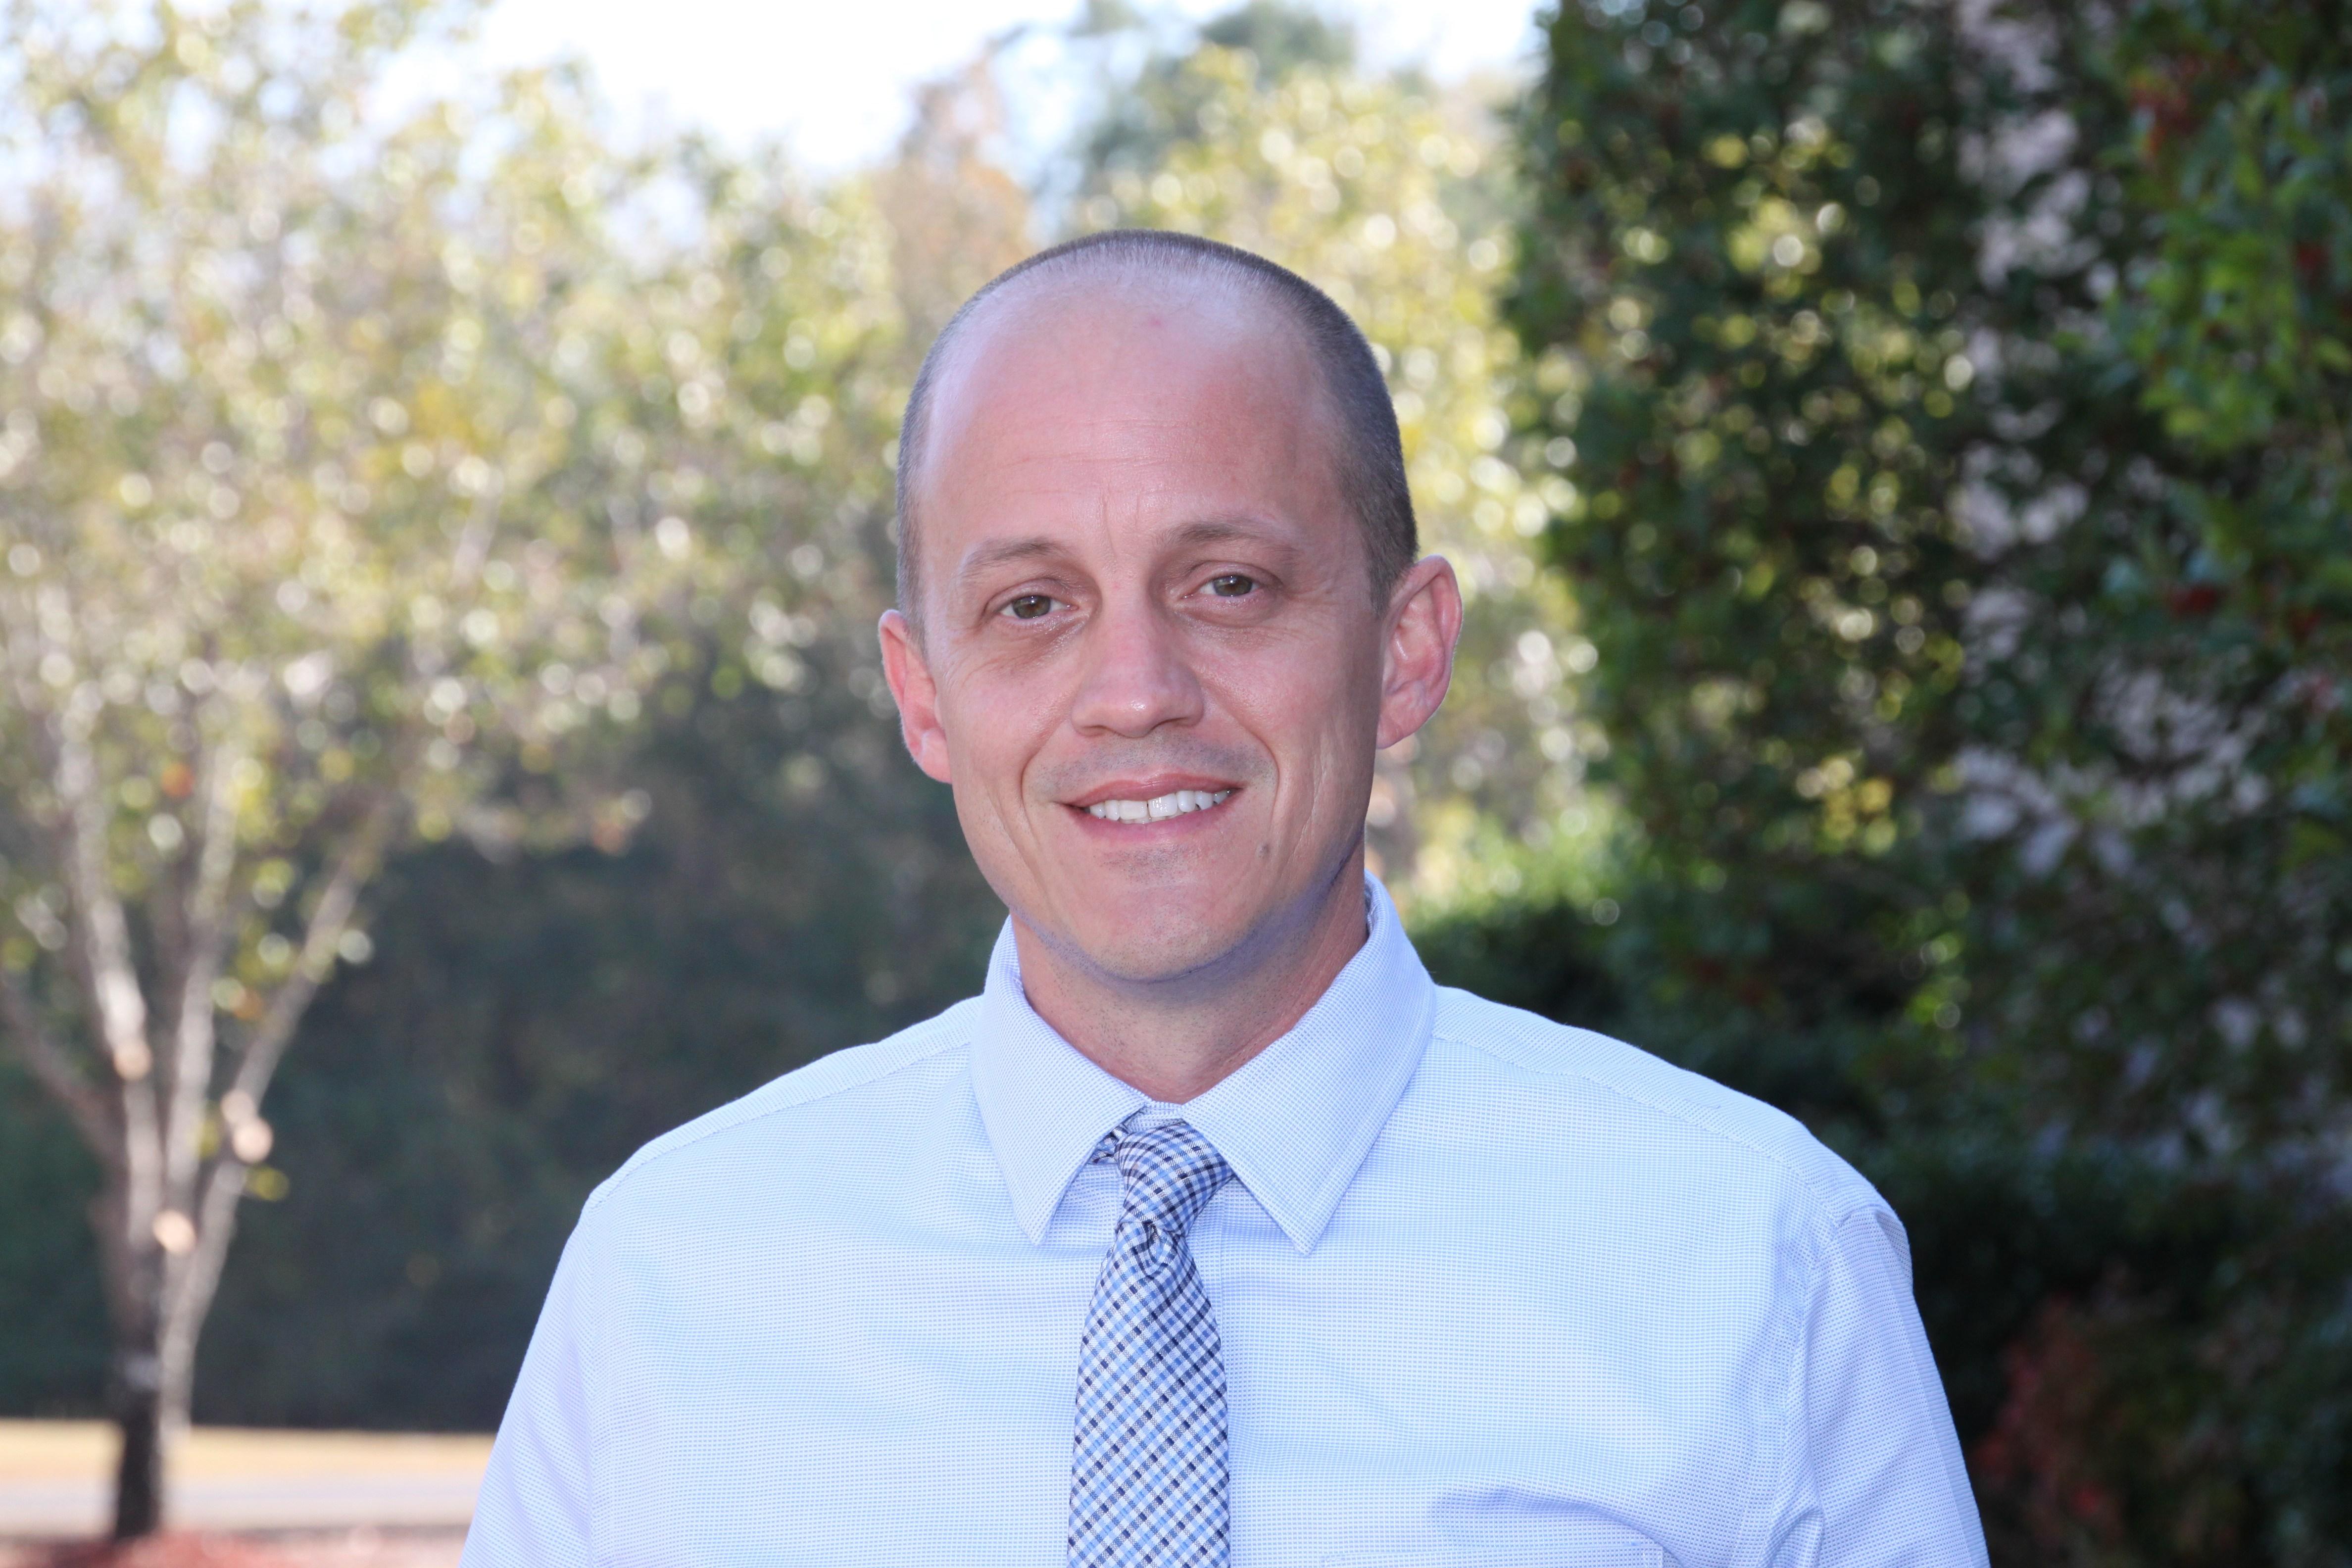 Principal Roberson